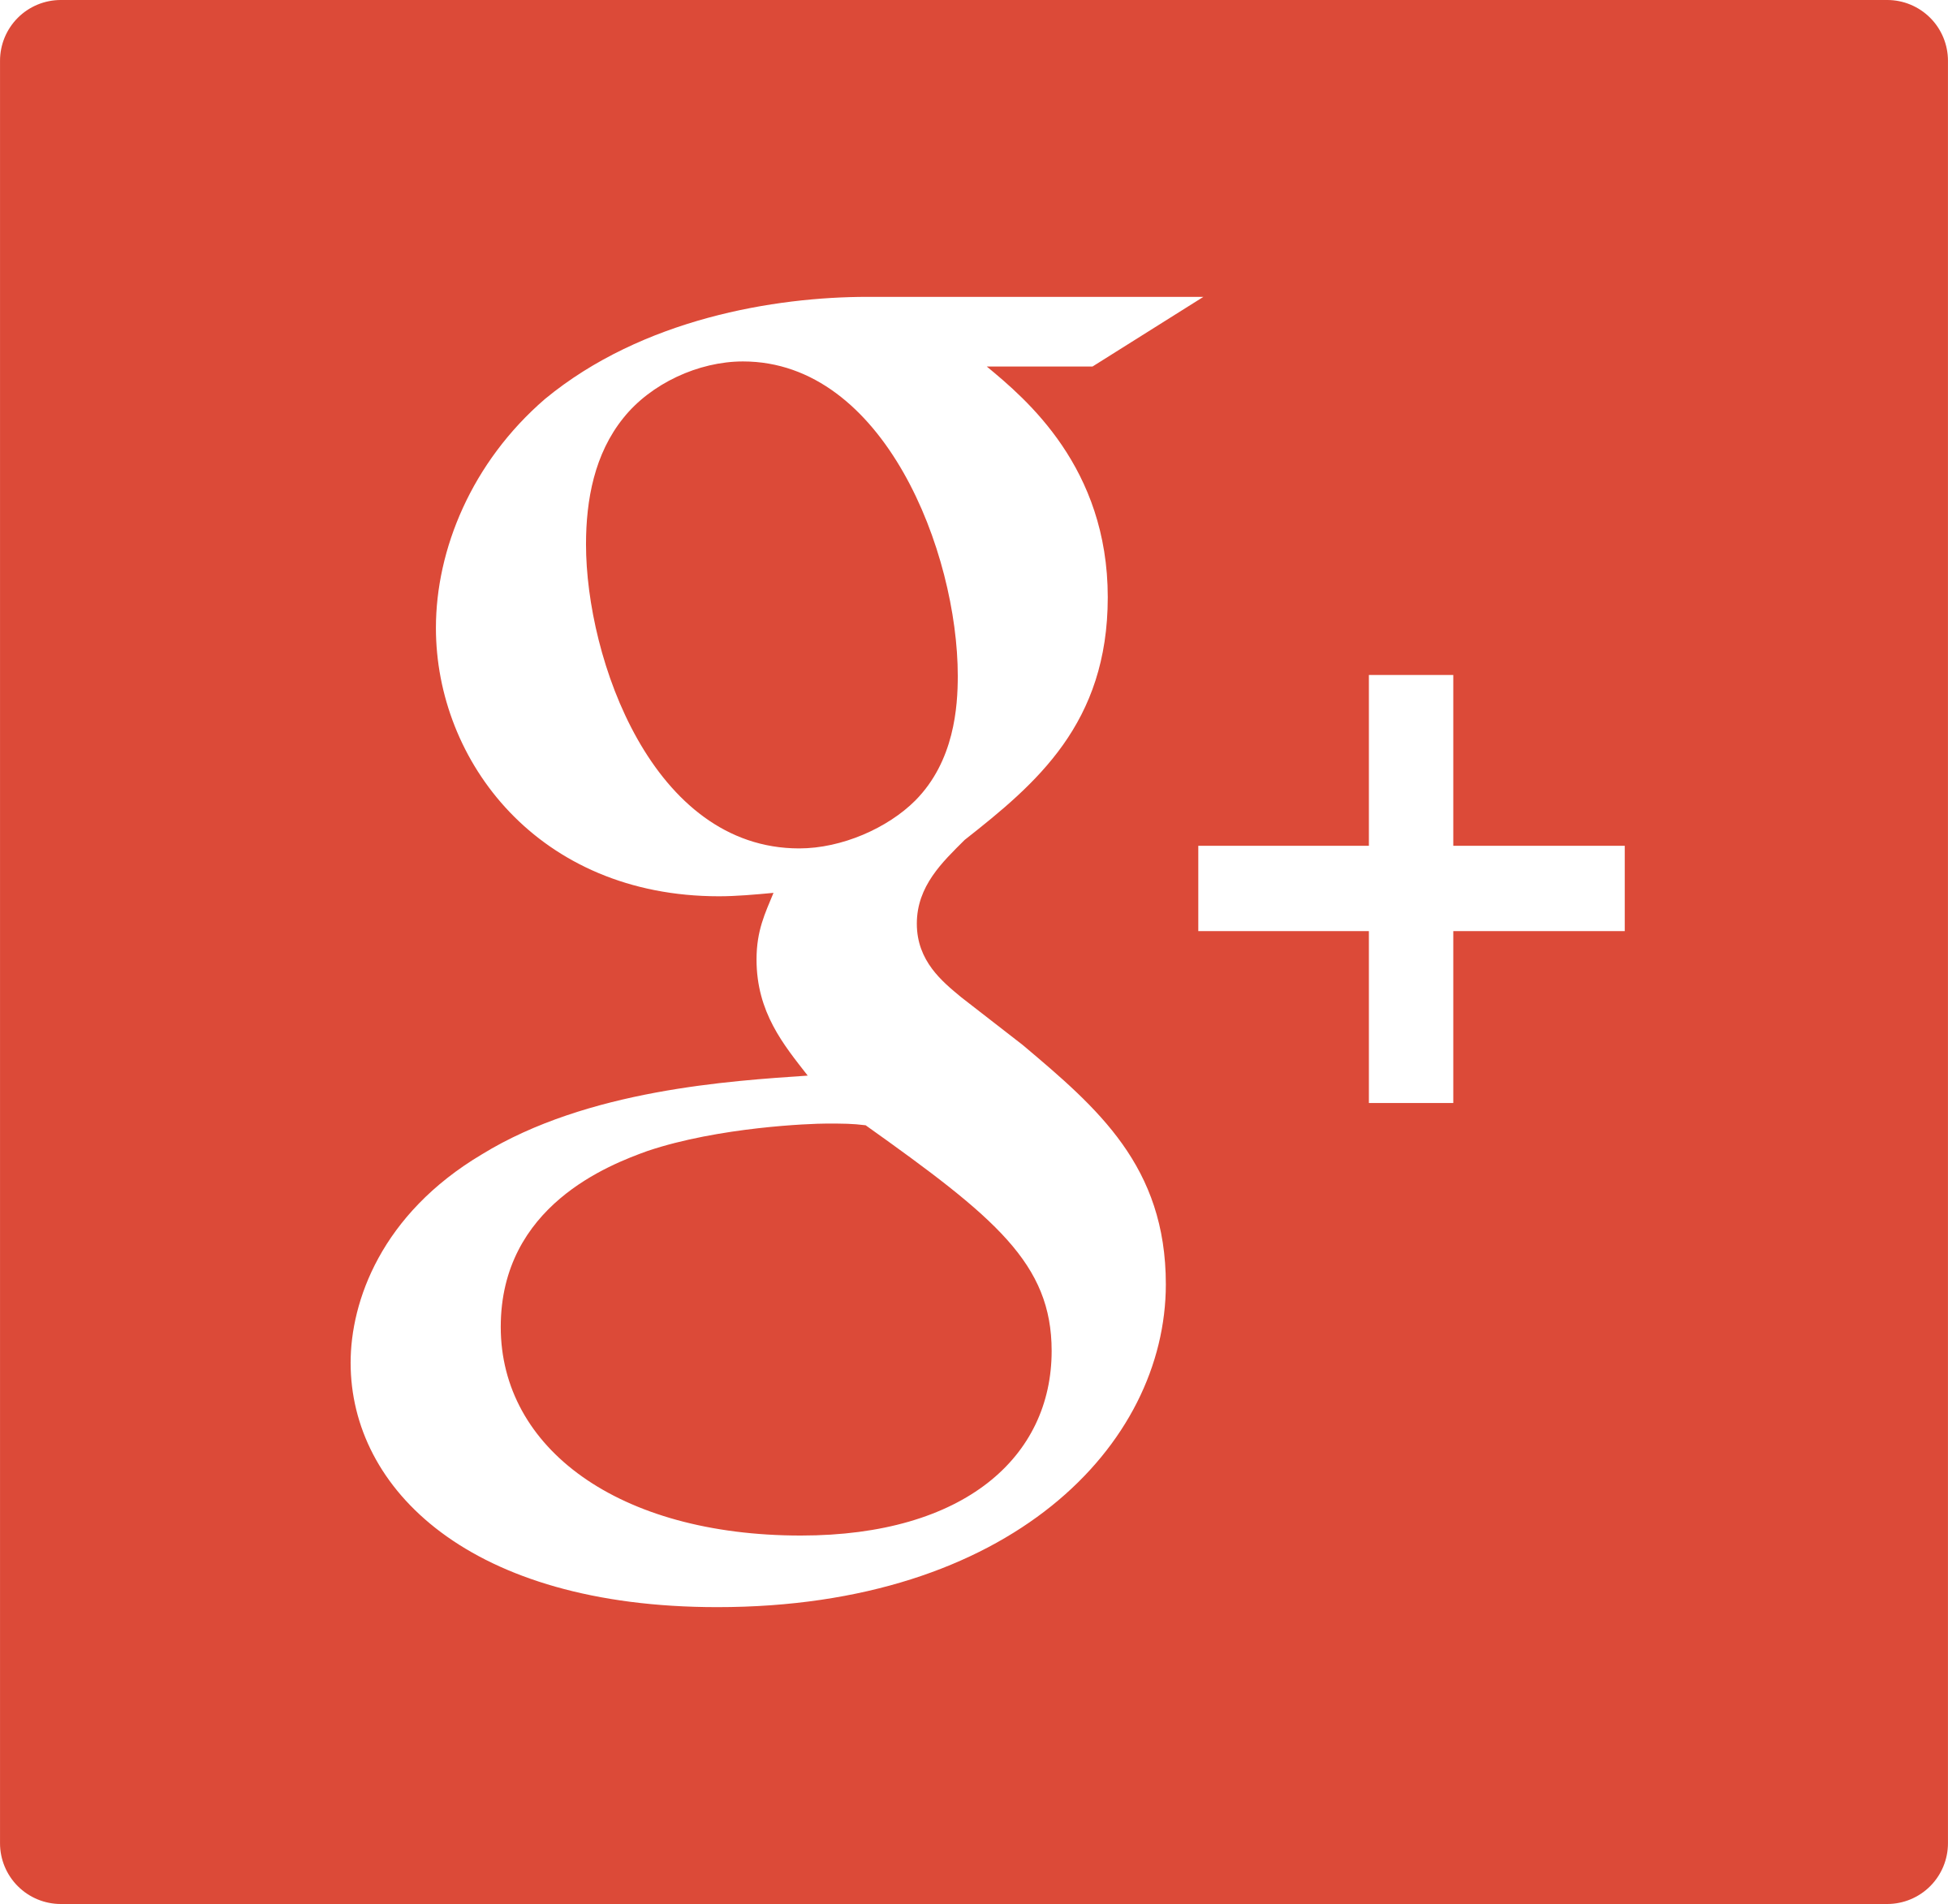 Image result for google plus logo